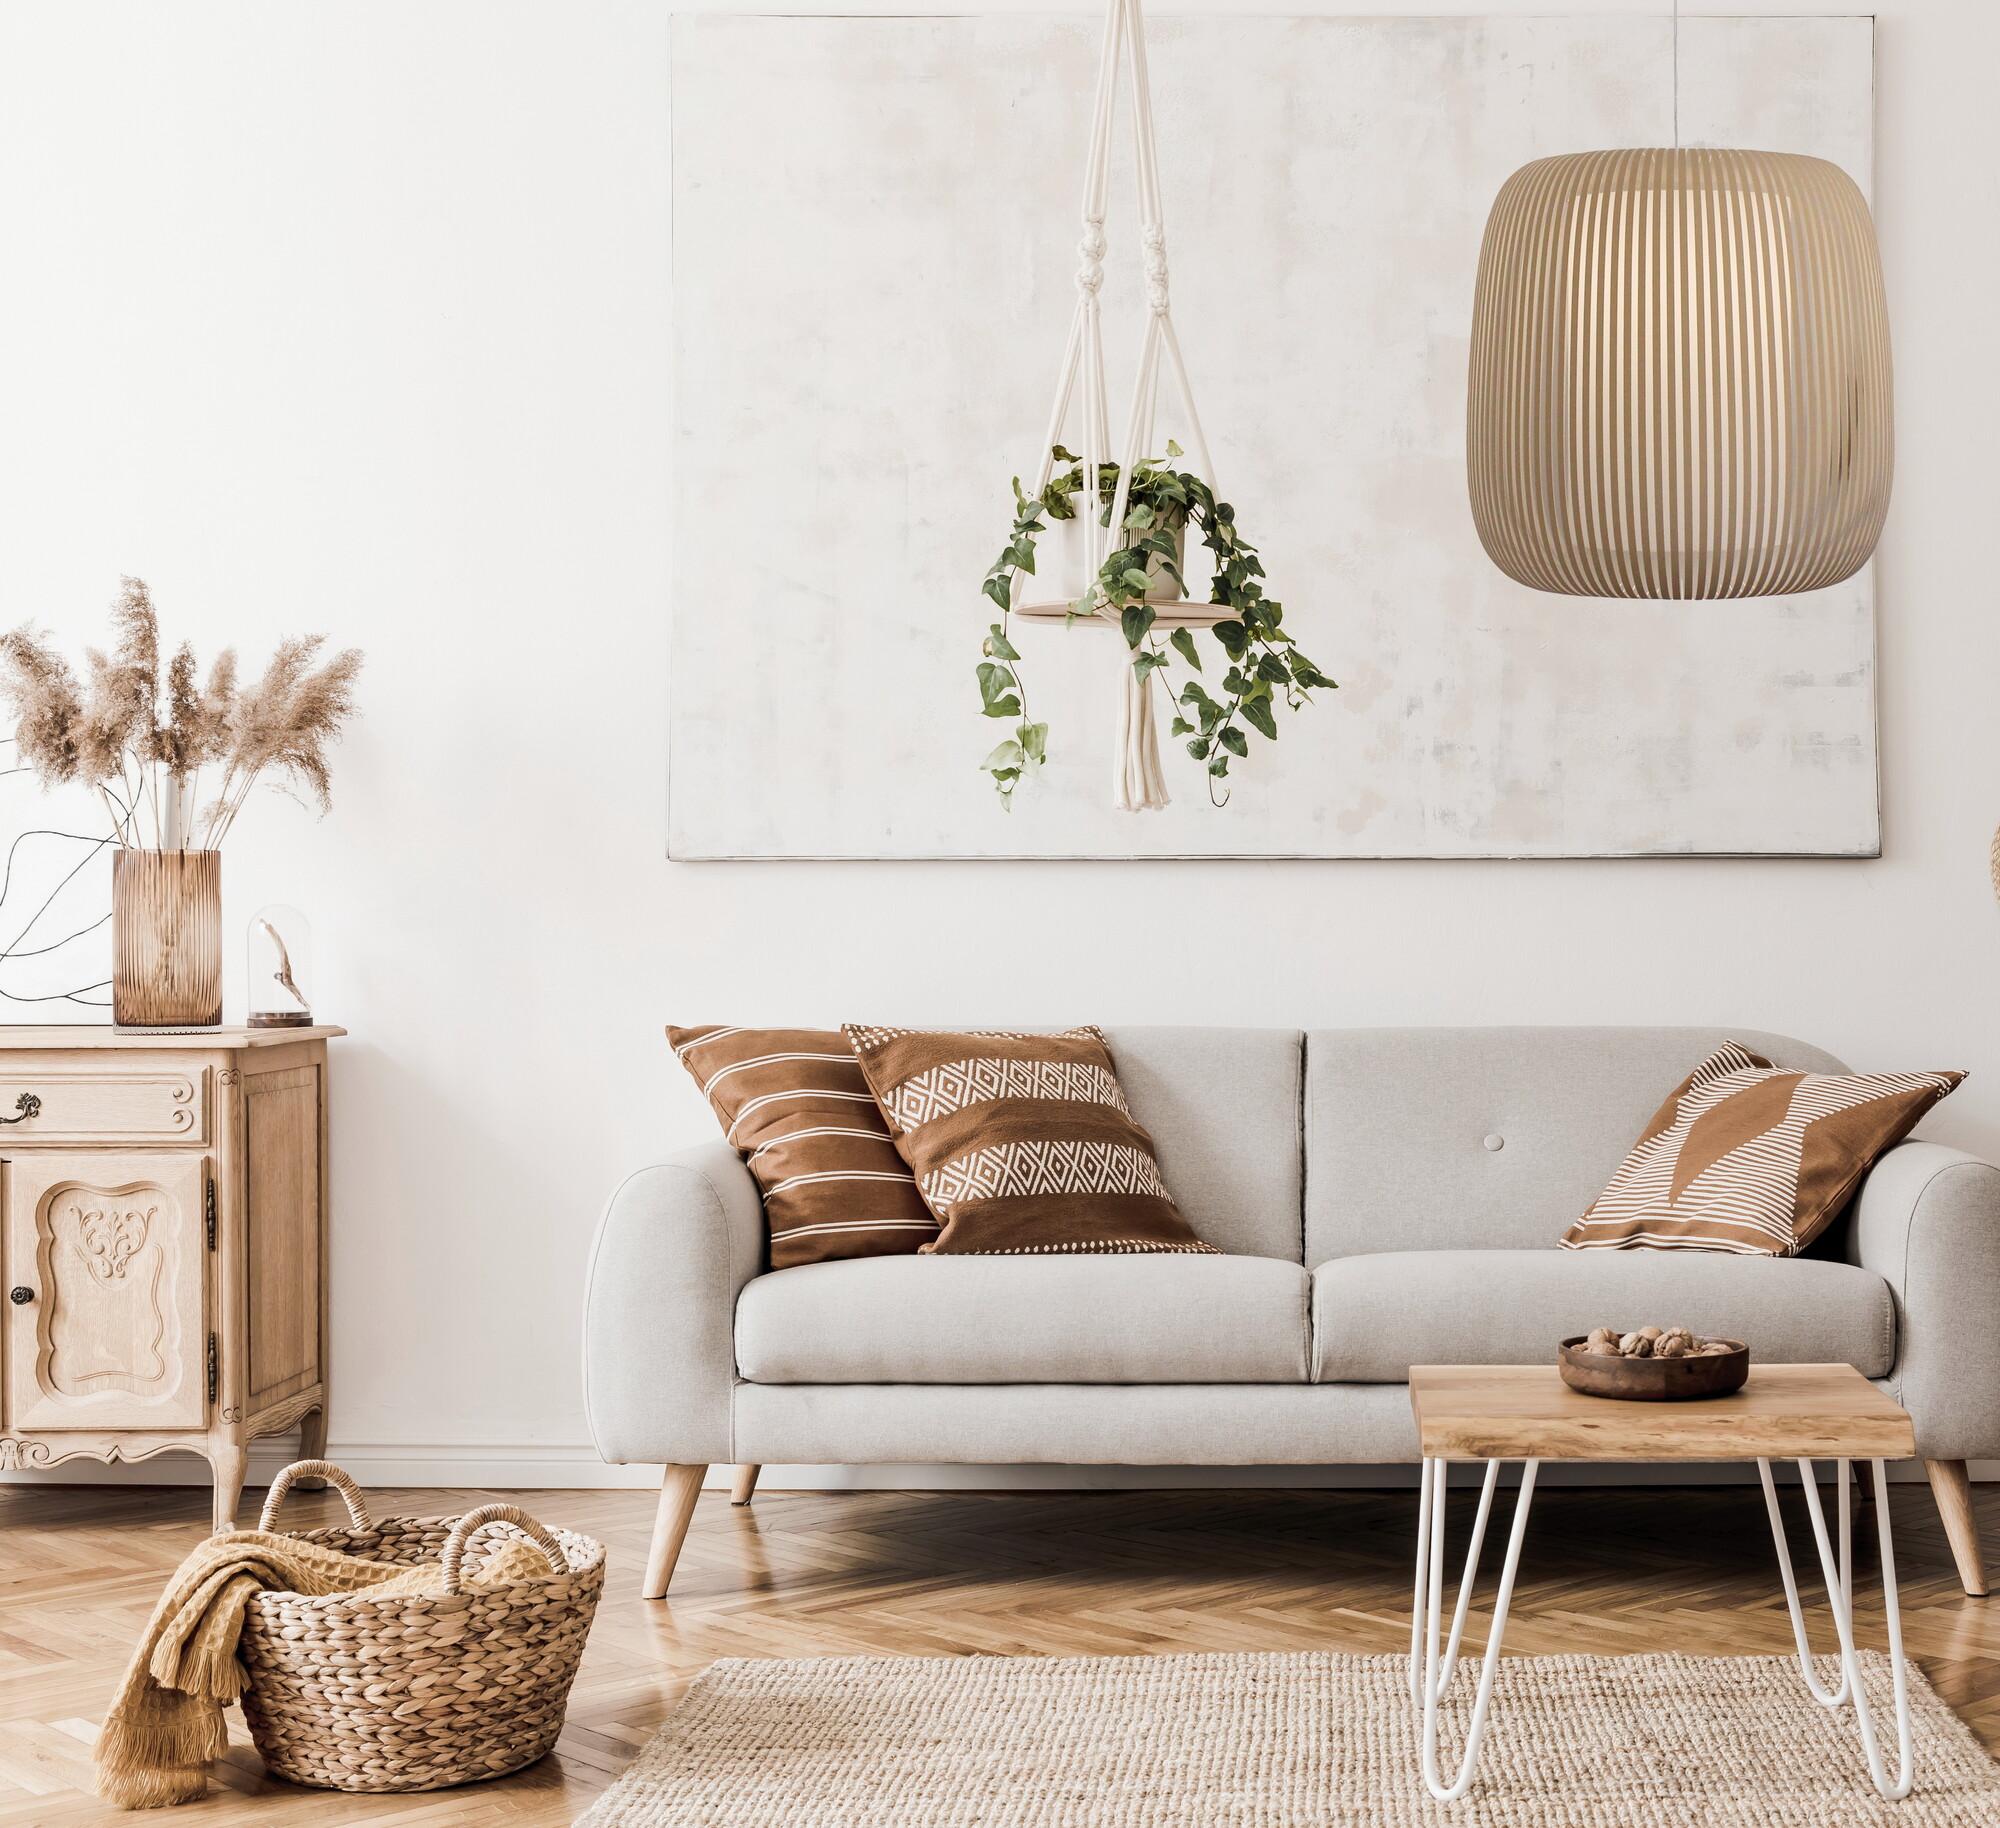 GRACE Hanglamp E27 1x Bruin